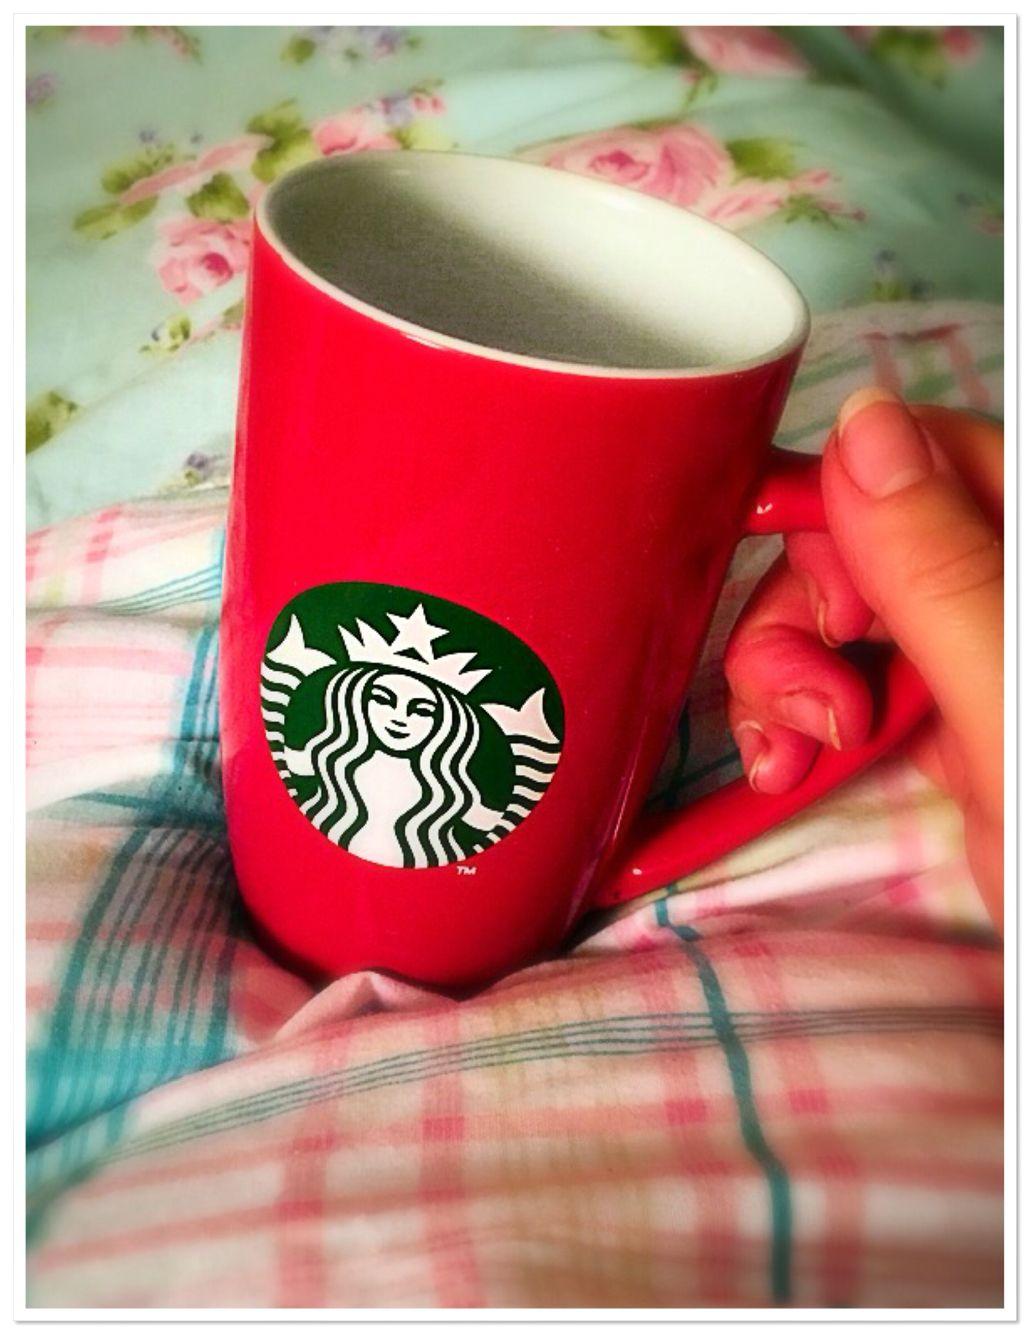 My #nightcap ☕️ #mug #red #redmug #starbucks #starbucksmug #merchandise #cupoftea #decaf #brew #goodnight #chills #bedtime #floral #fashion #fashionista #blogging #fblogger #pearlsandvagabonds @starbucks